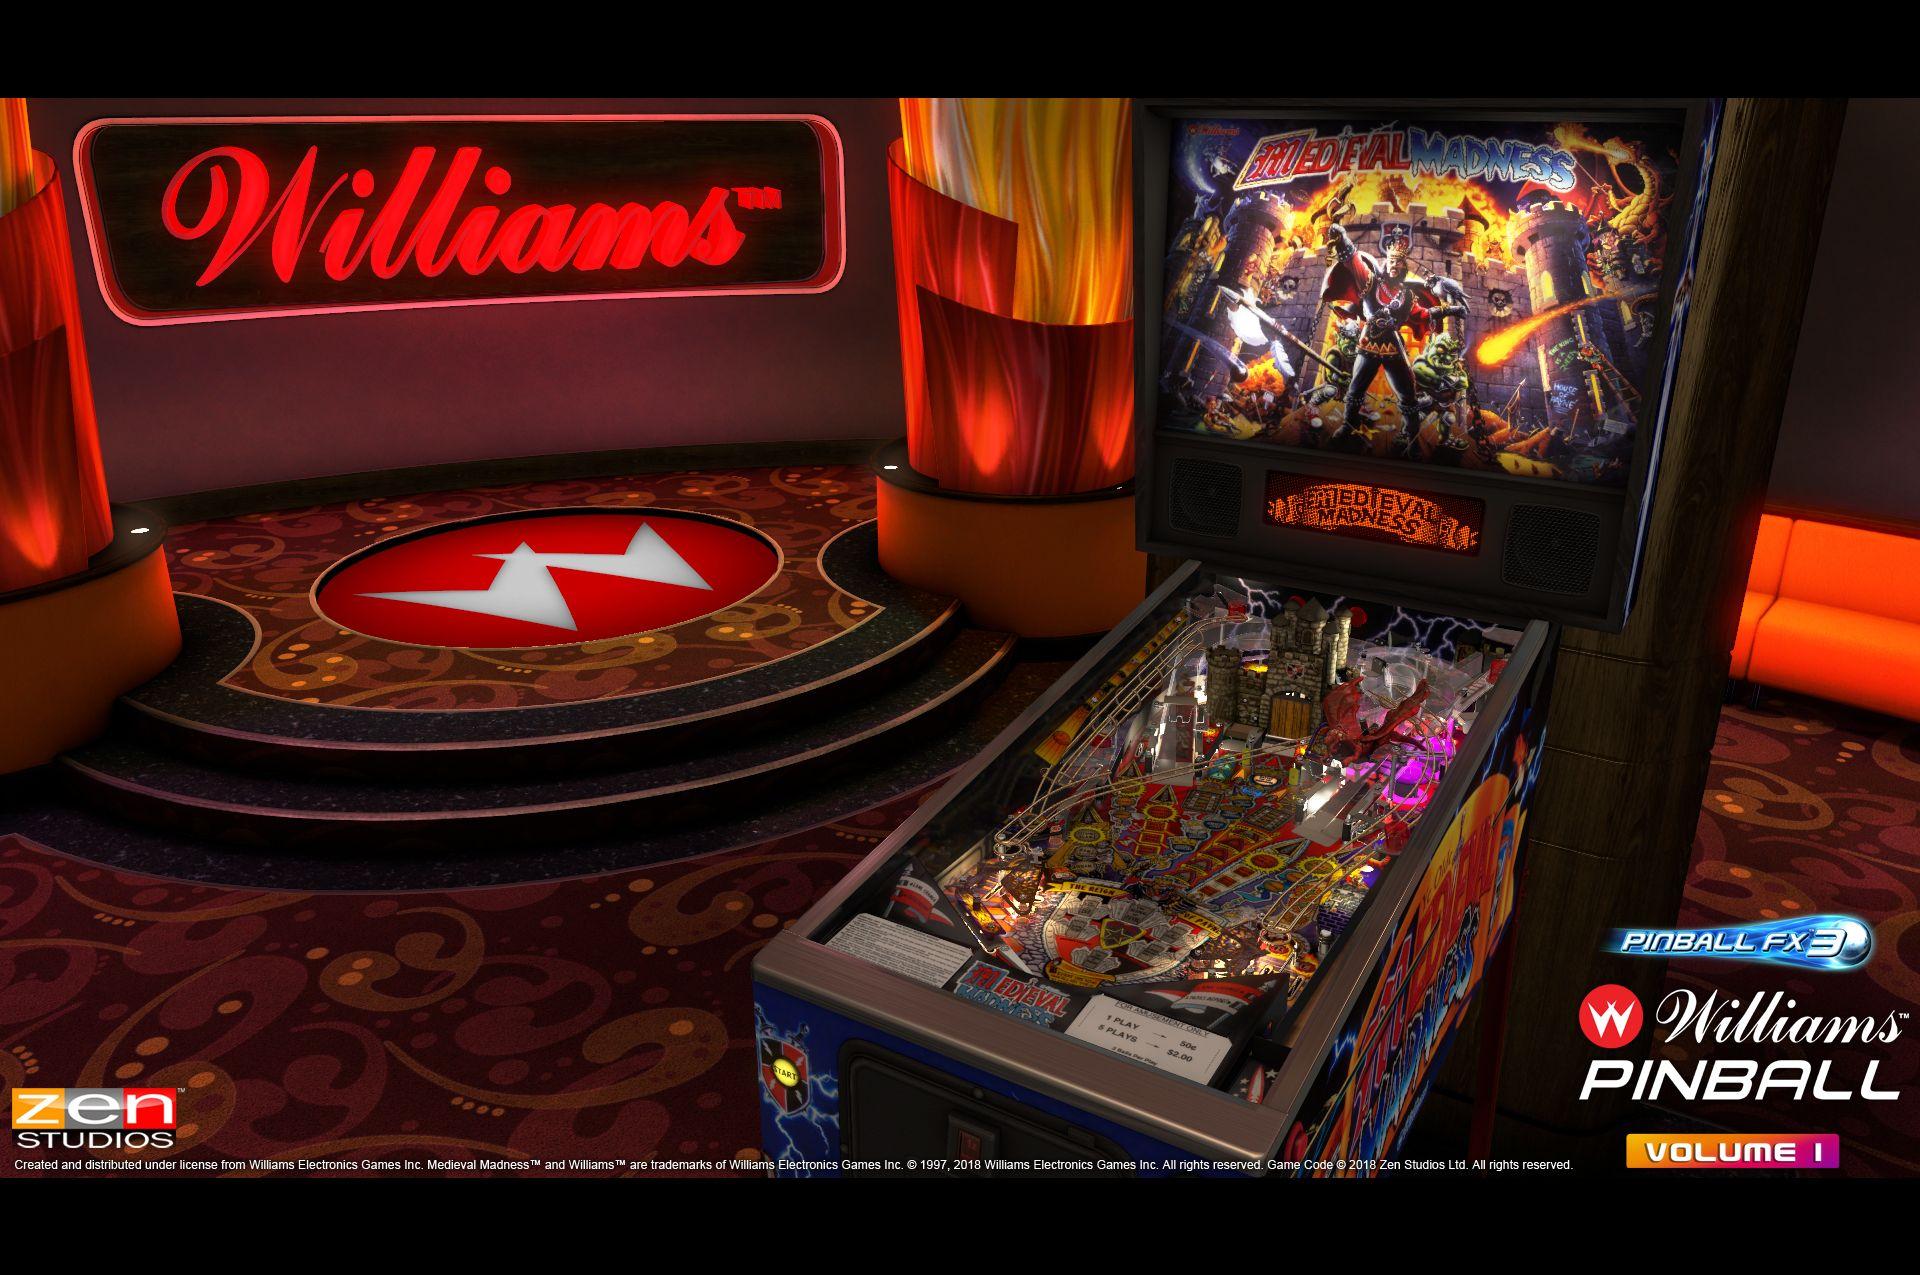 Pinball FX3 game readies iconic Williams and Bally machines